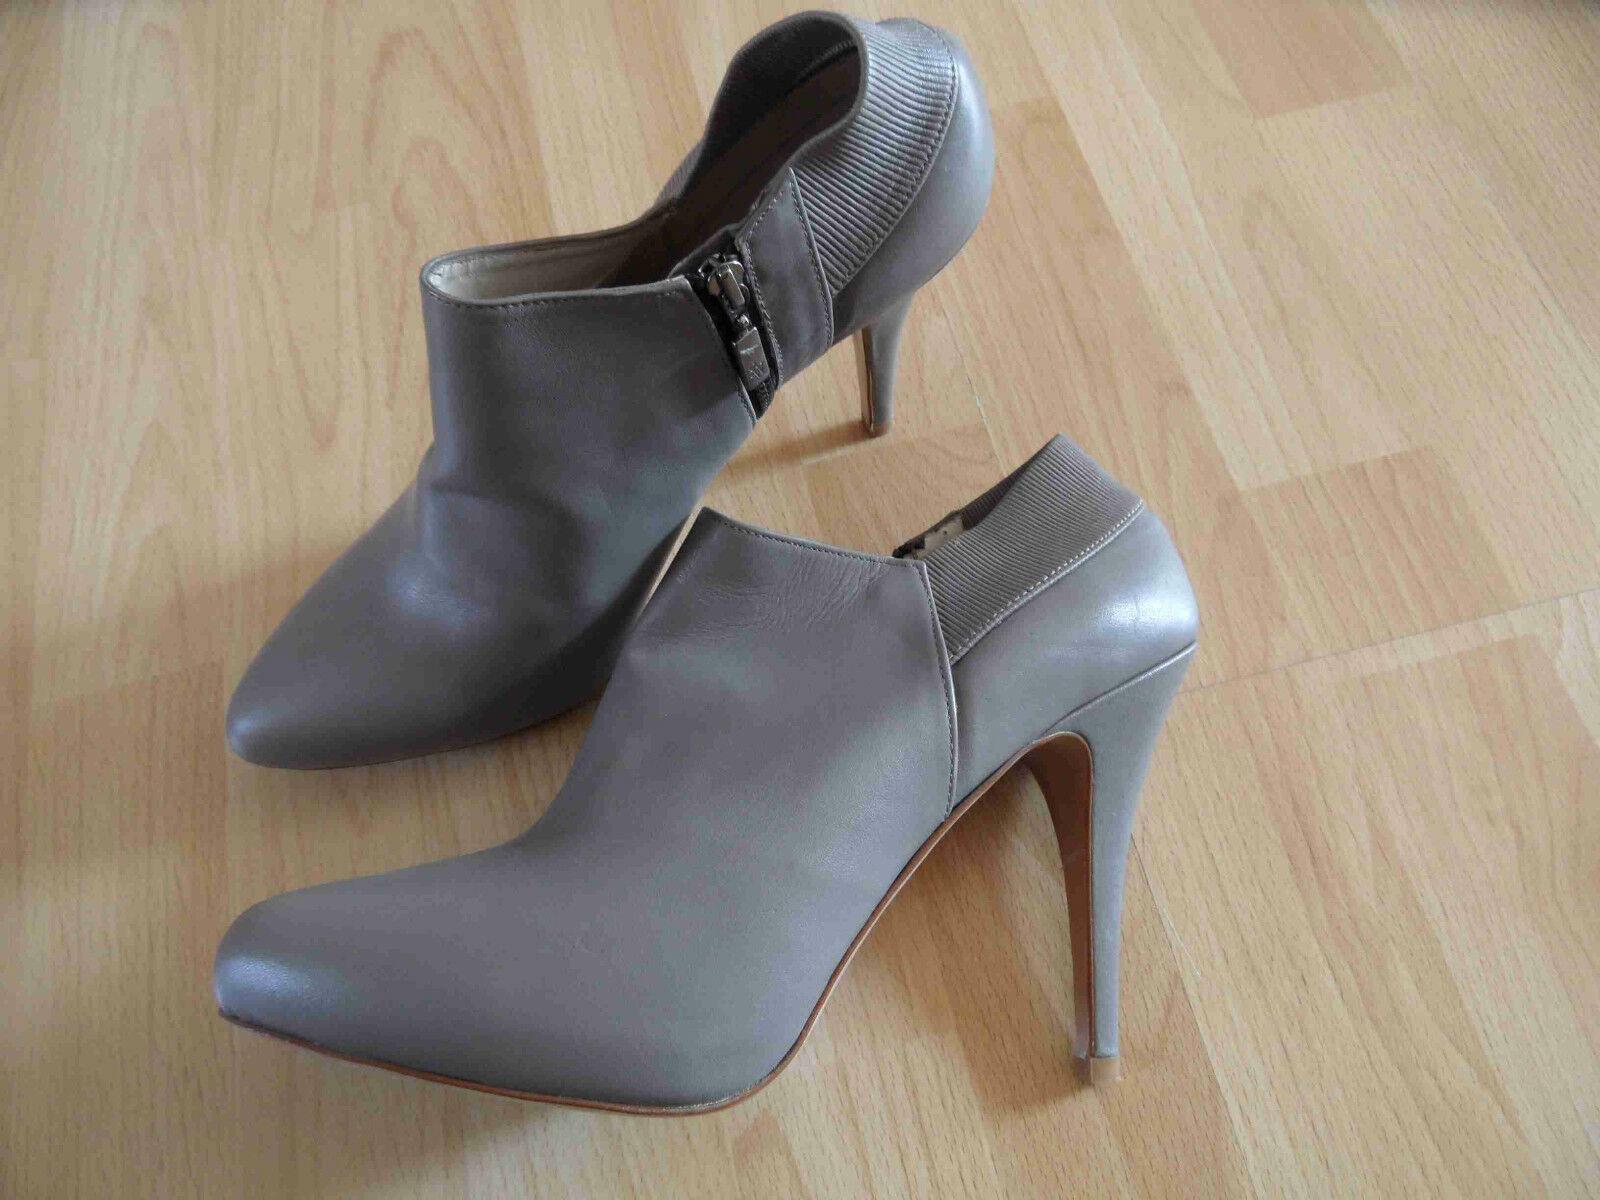 ZARA stylische Ancle Stiefel High Heels NB2 grau Gr. 40 NEU NB2 Heels da2680